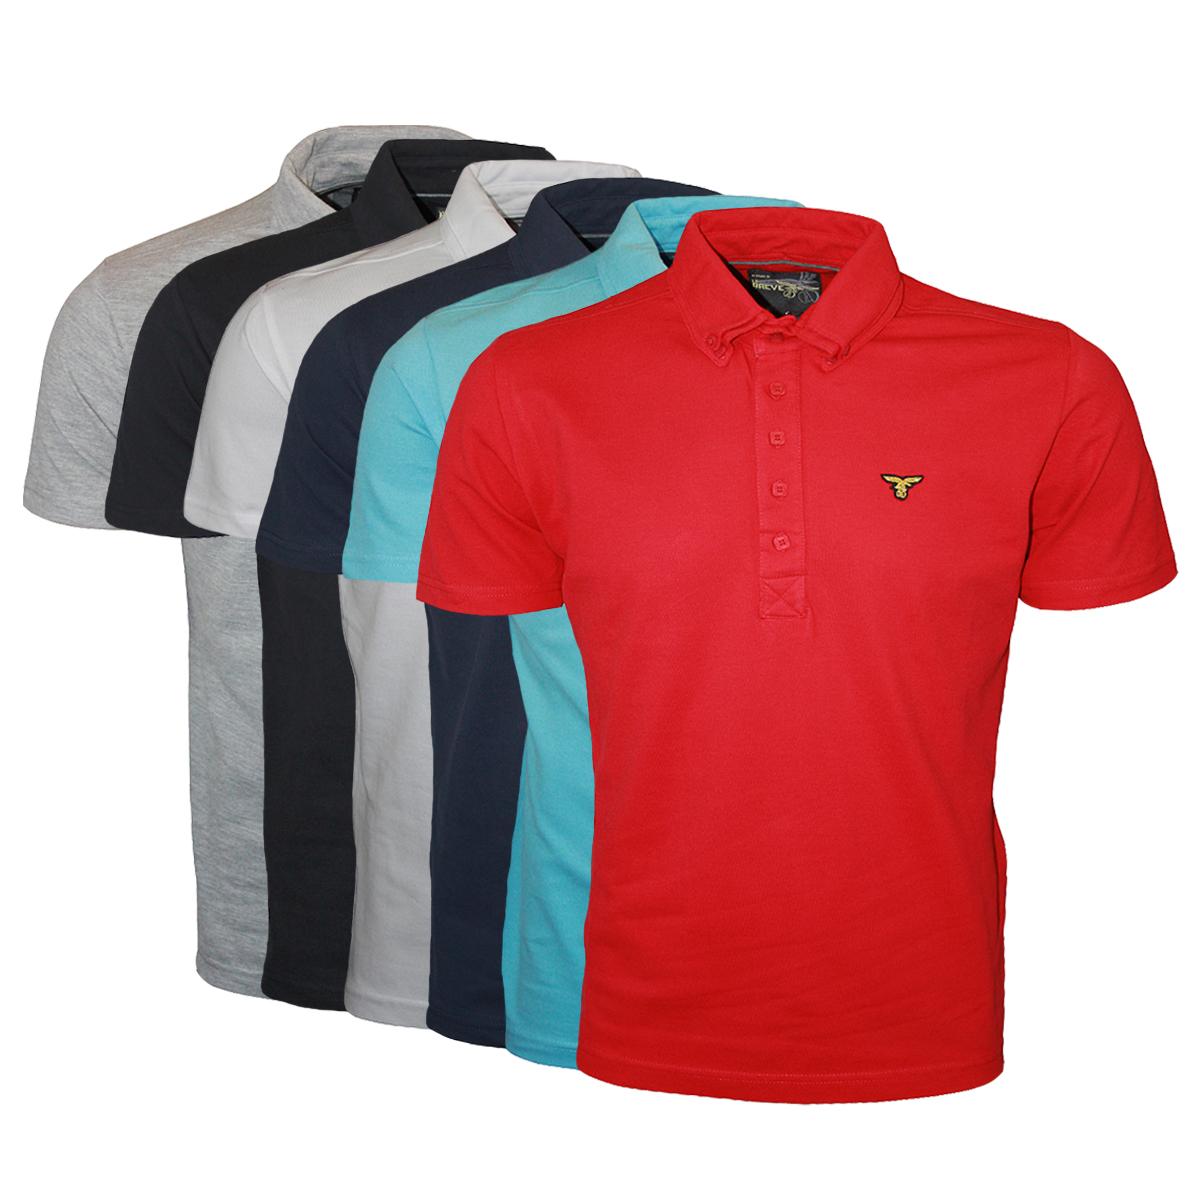 Le breve jeans mens designer bill collar polo neck t shirt top sizes s xxl